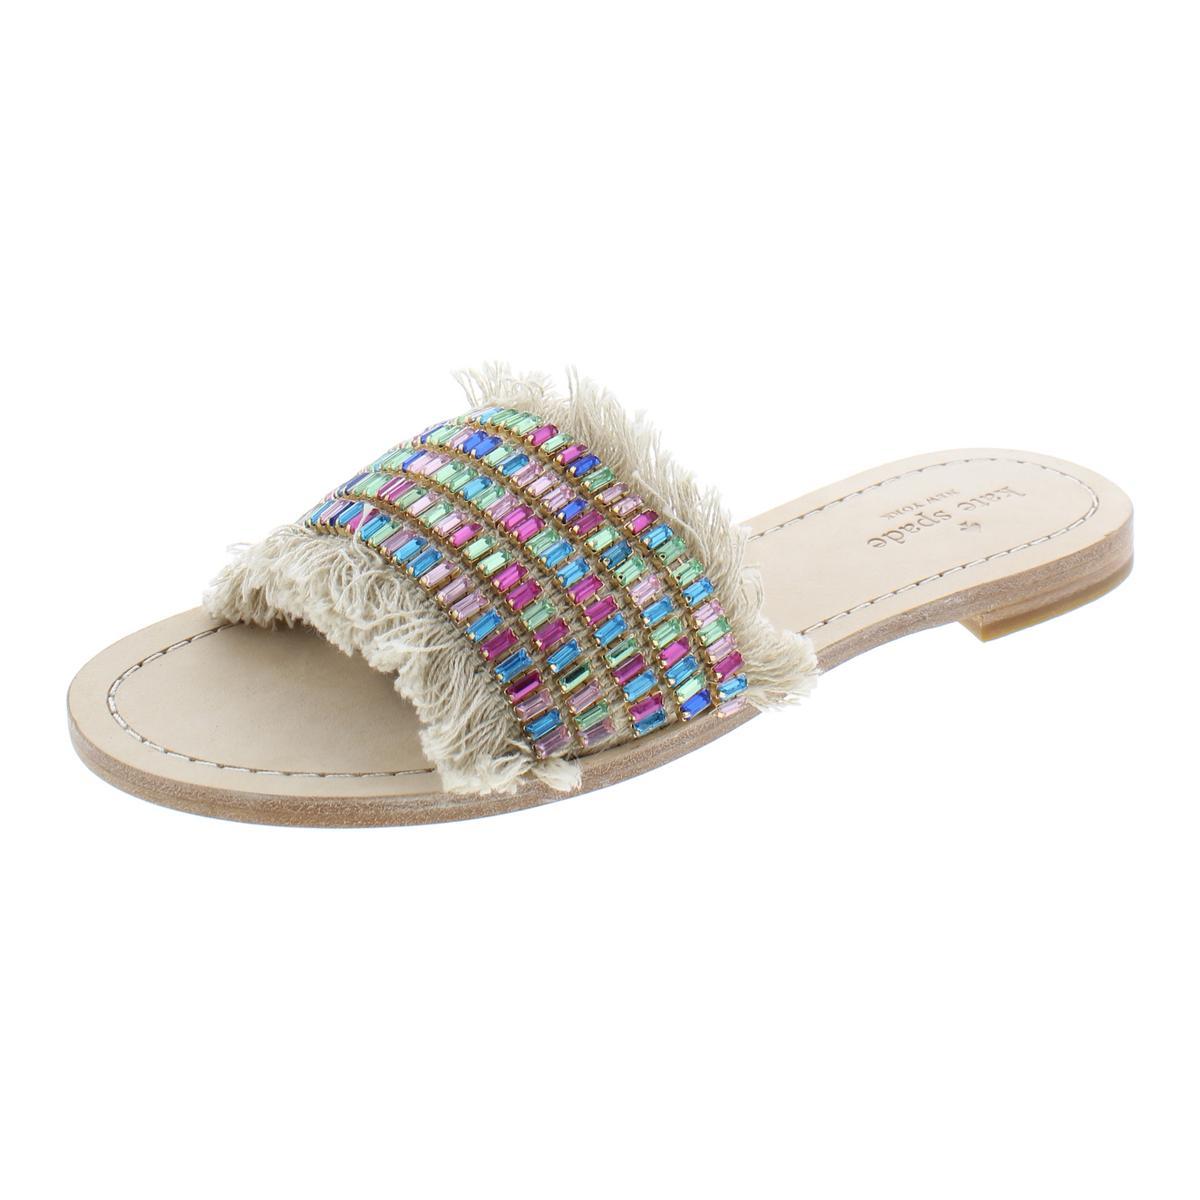 949e0b31ab83 Details about Kate Spade Womens Solaina Tan Casual Flat Sandals Shoes 8  Medium (B,M) BHFO 1070